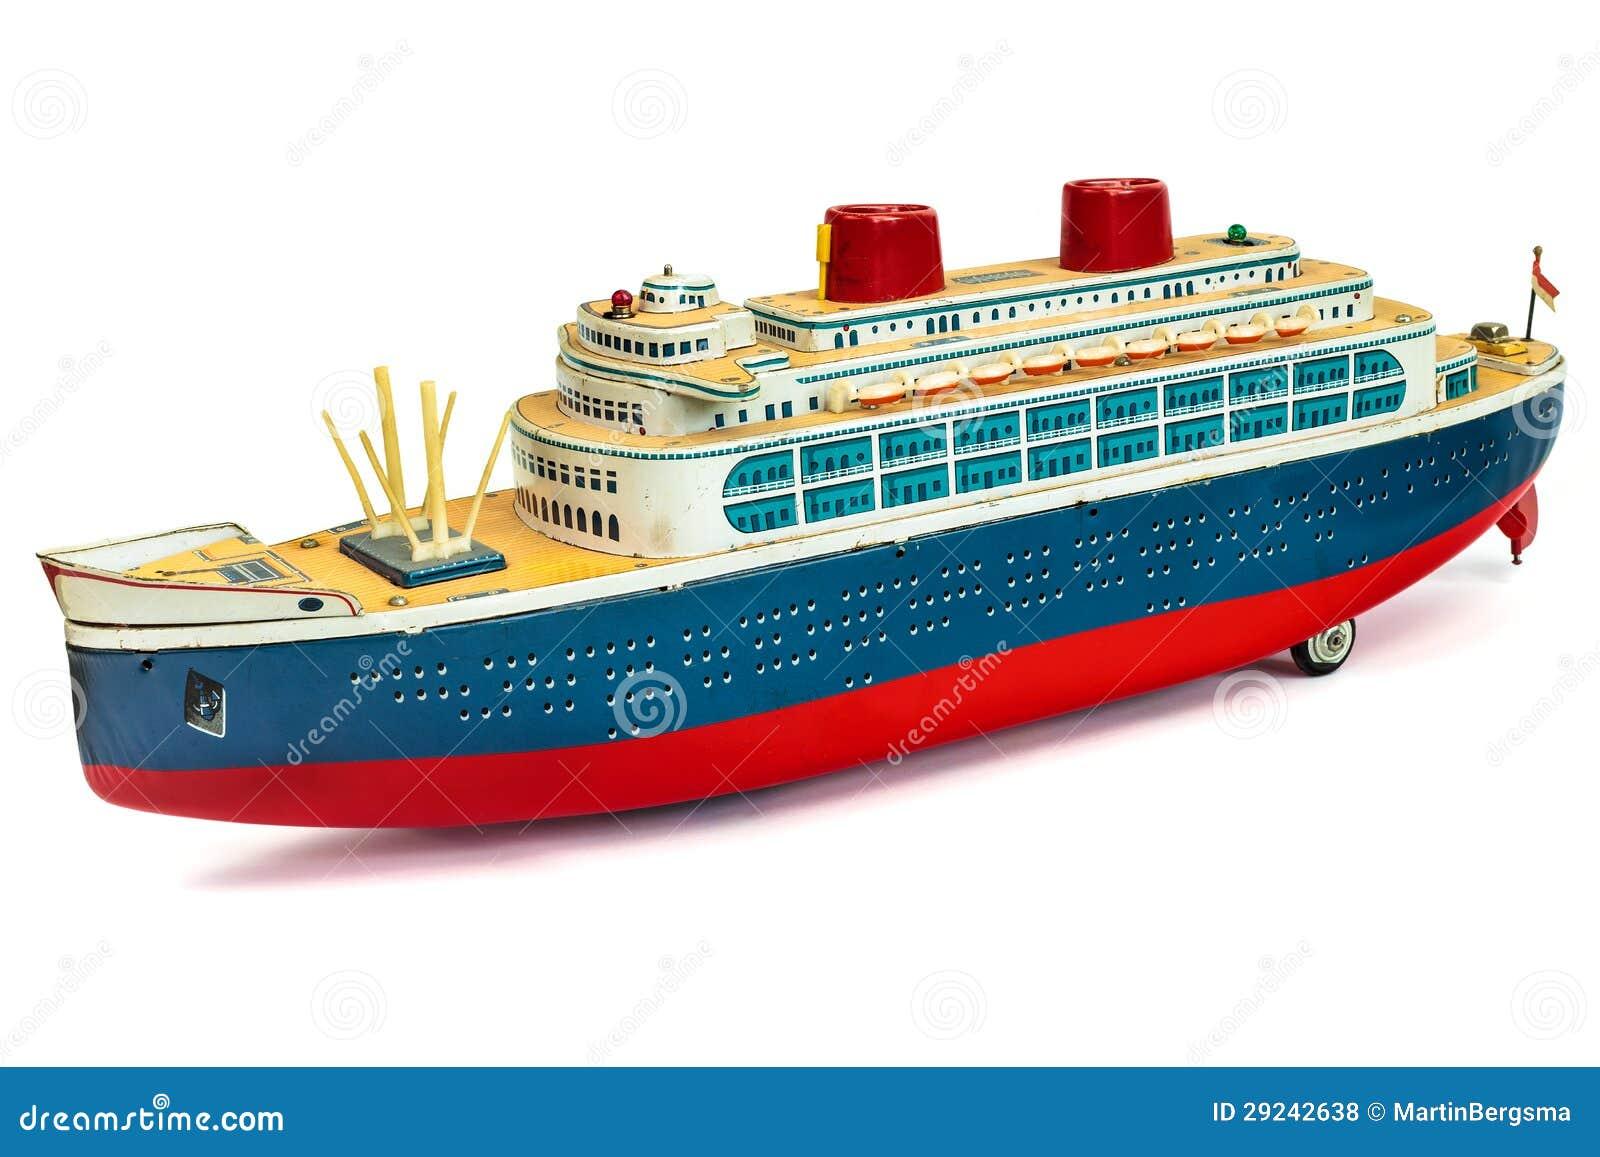 Antique Toy Cruise Ship On White Royalty Free Stock Photos - Image ...